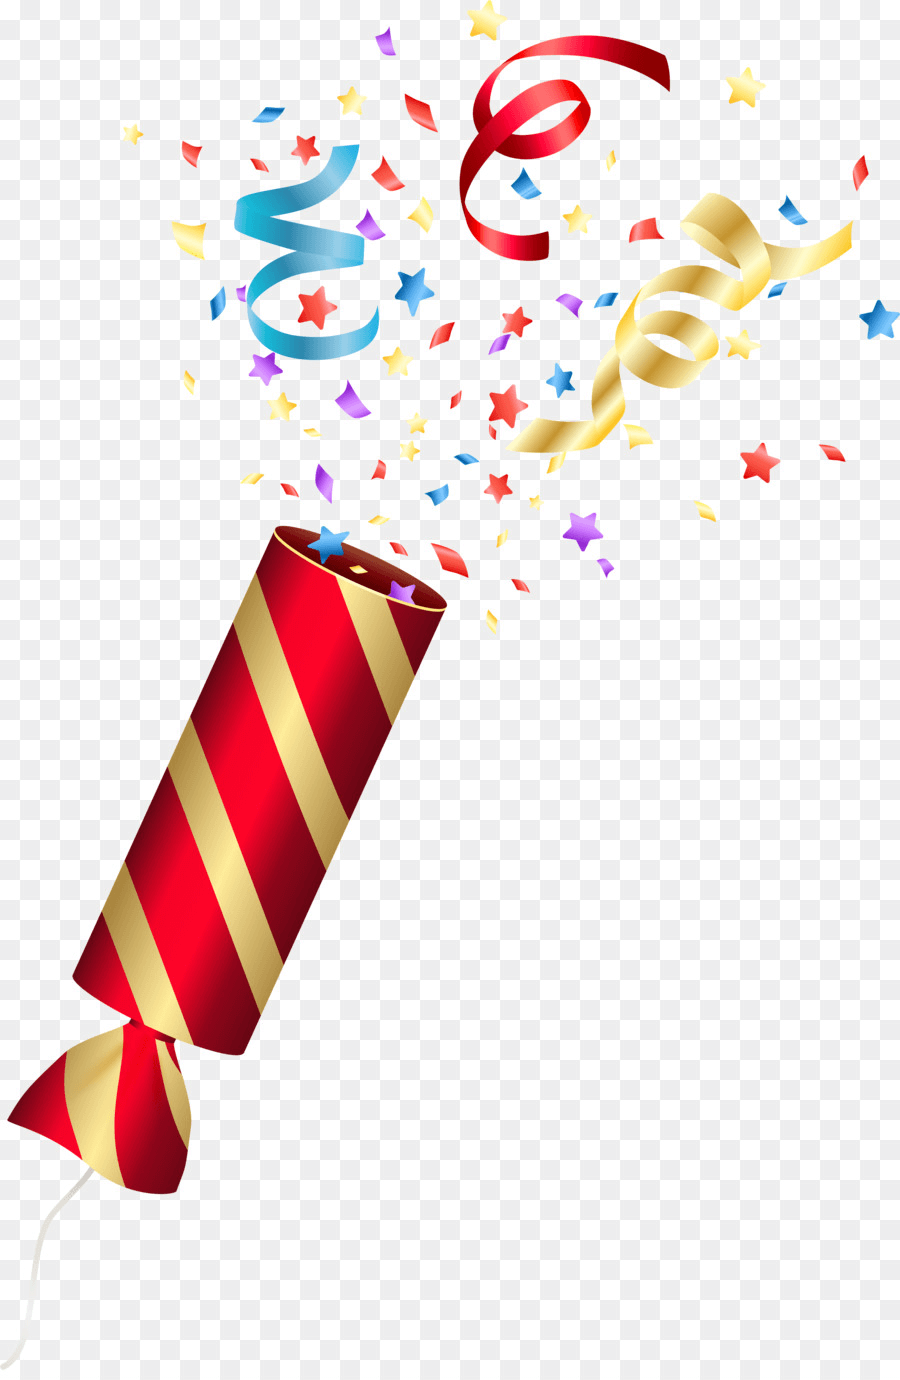 Birthday Cartoon Confetti png